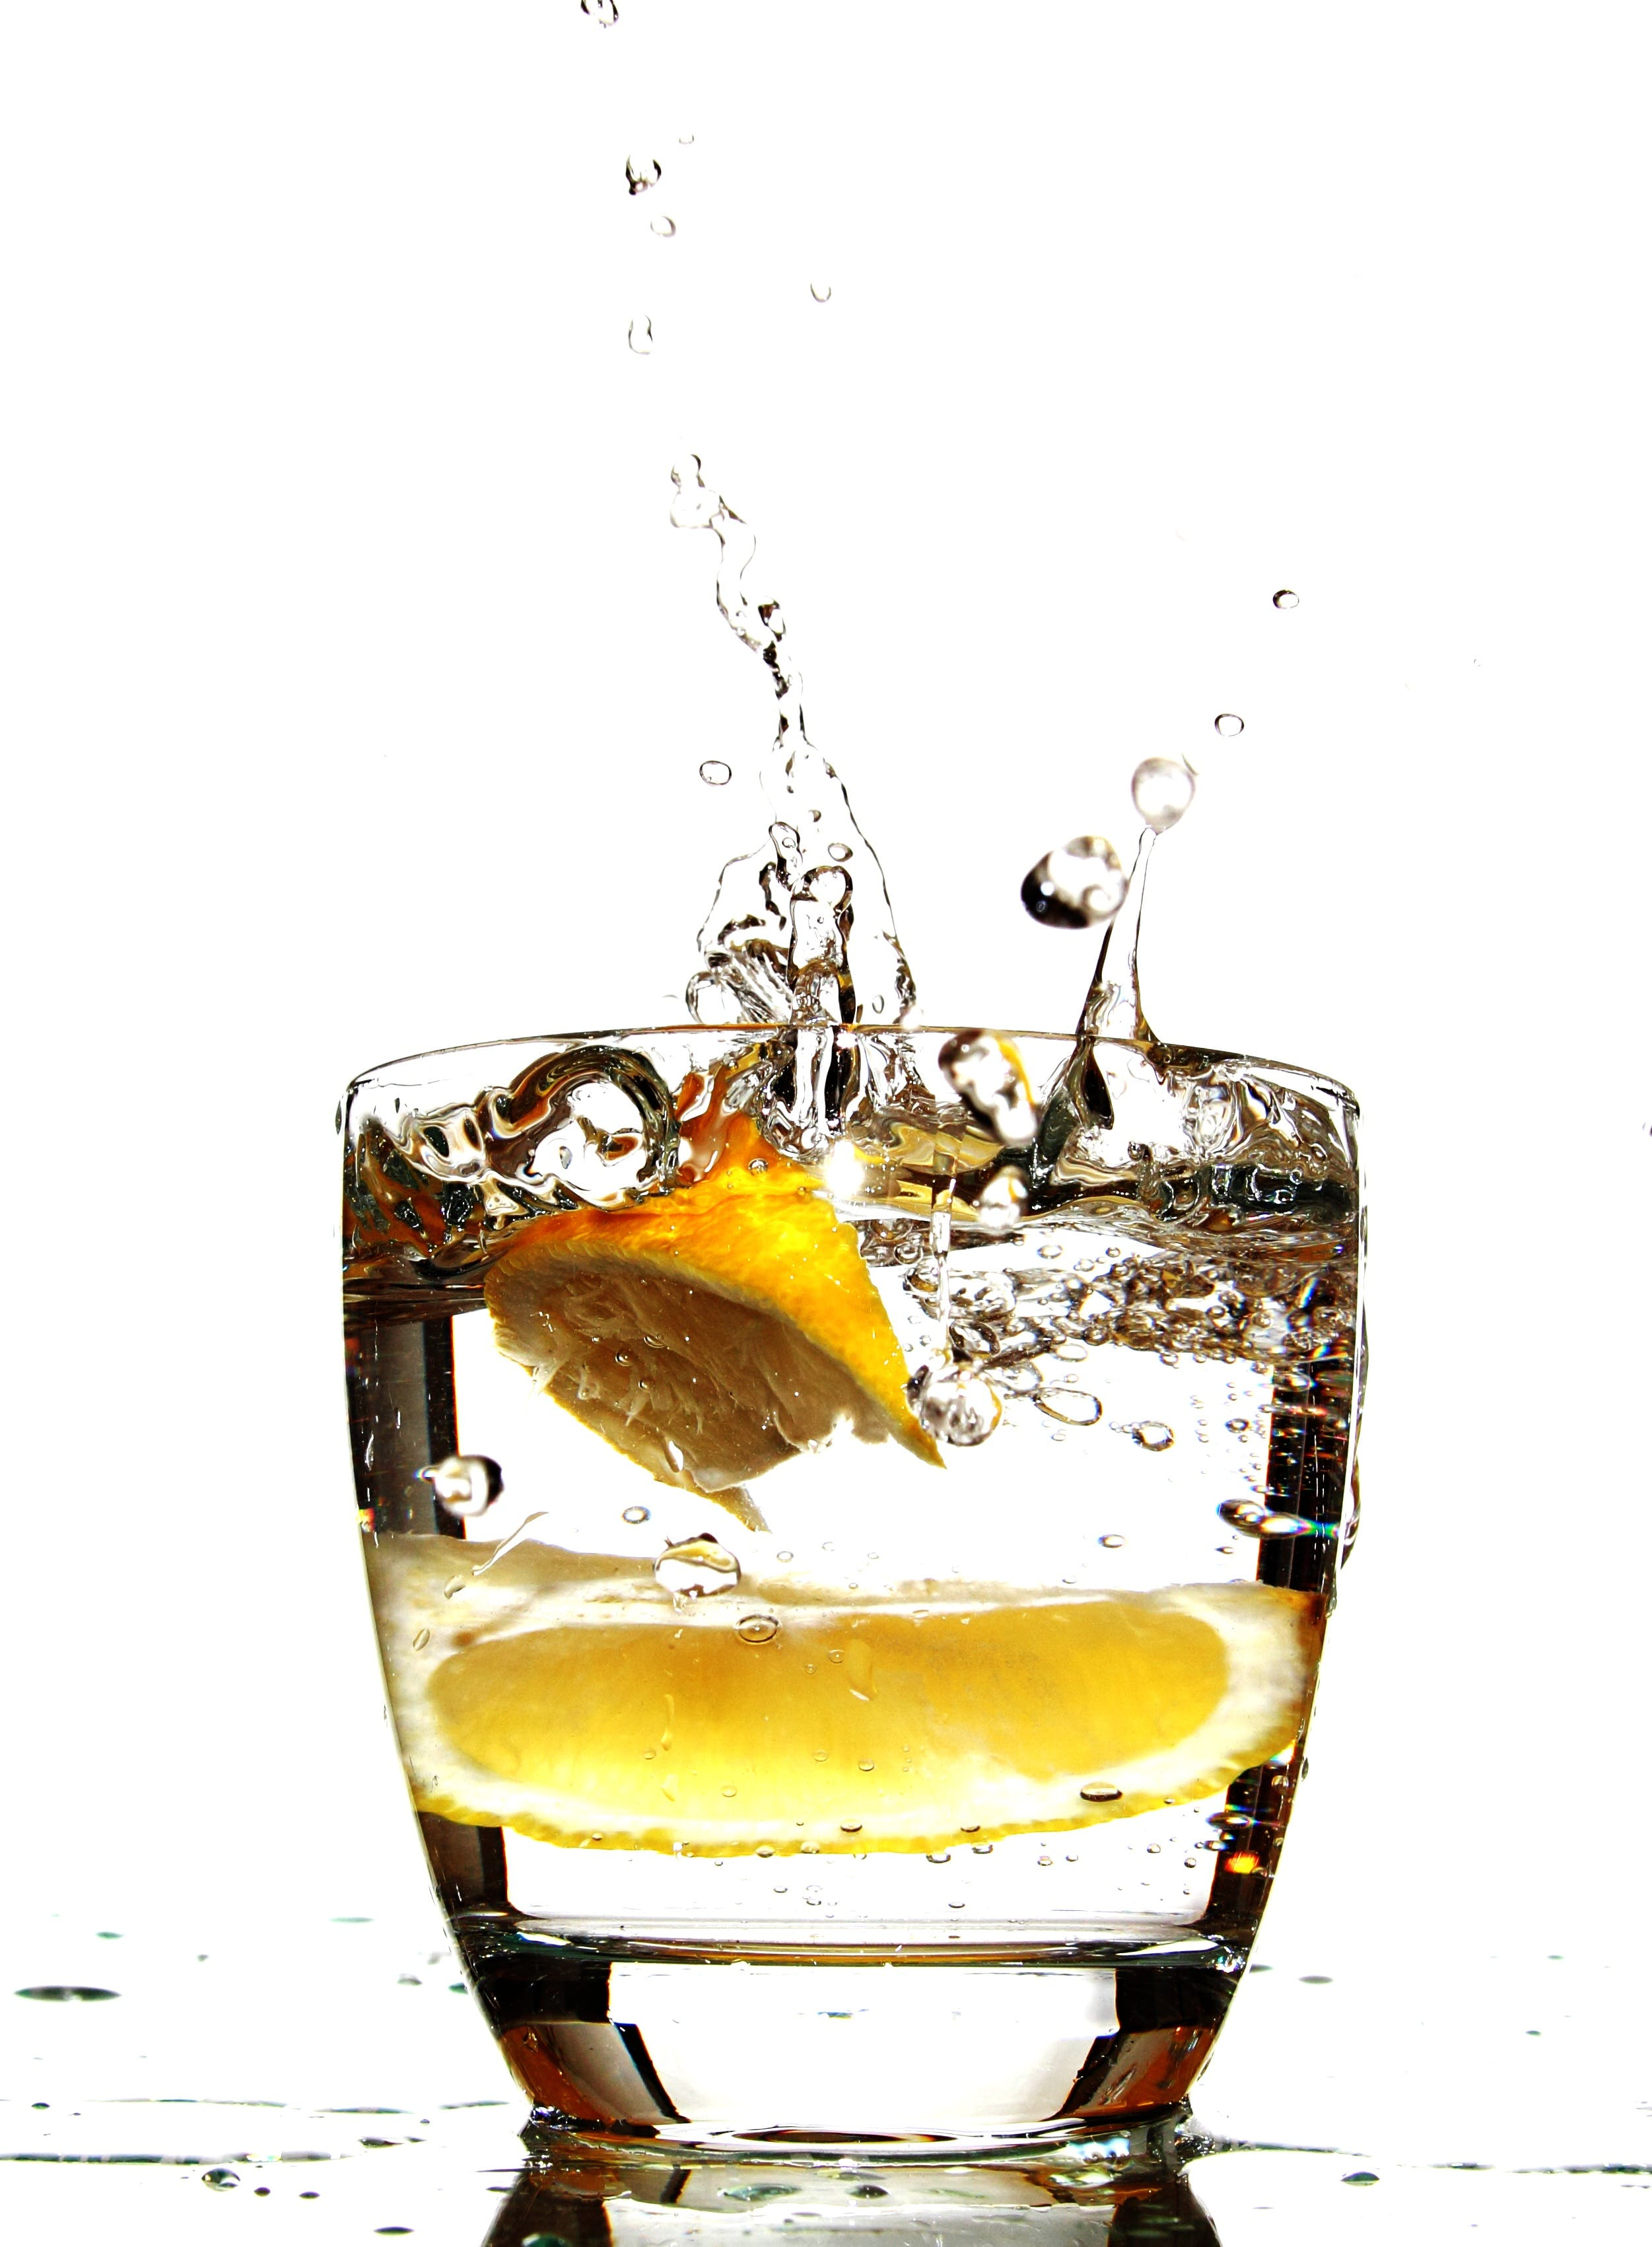 Lemon in Drinking Glass